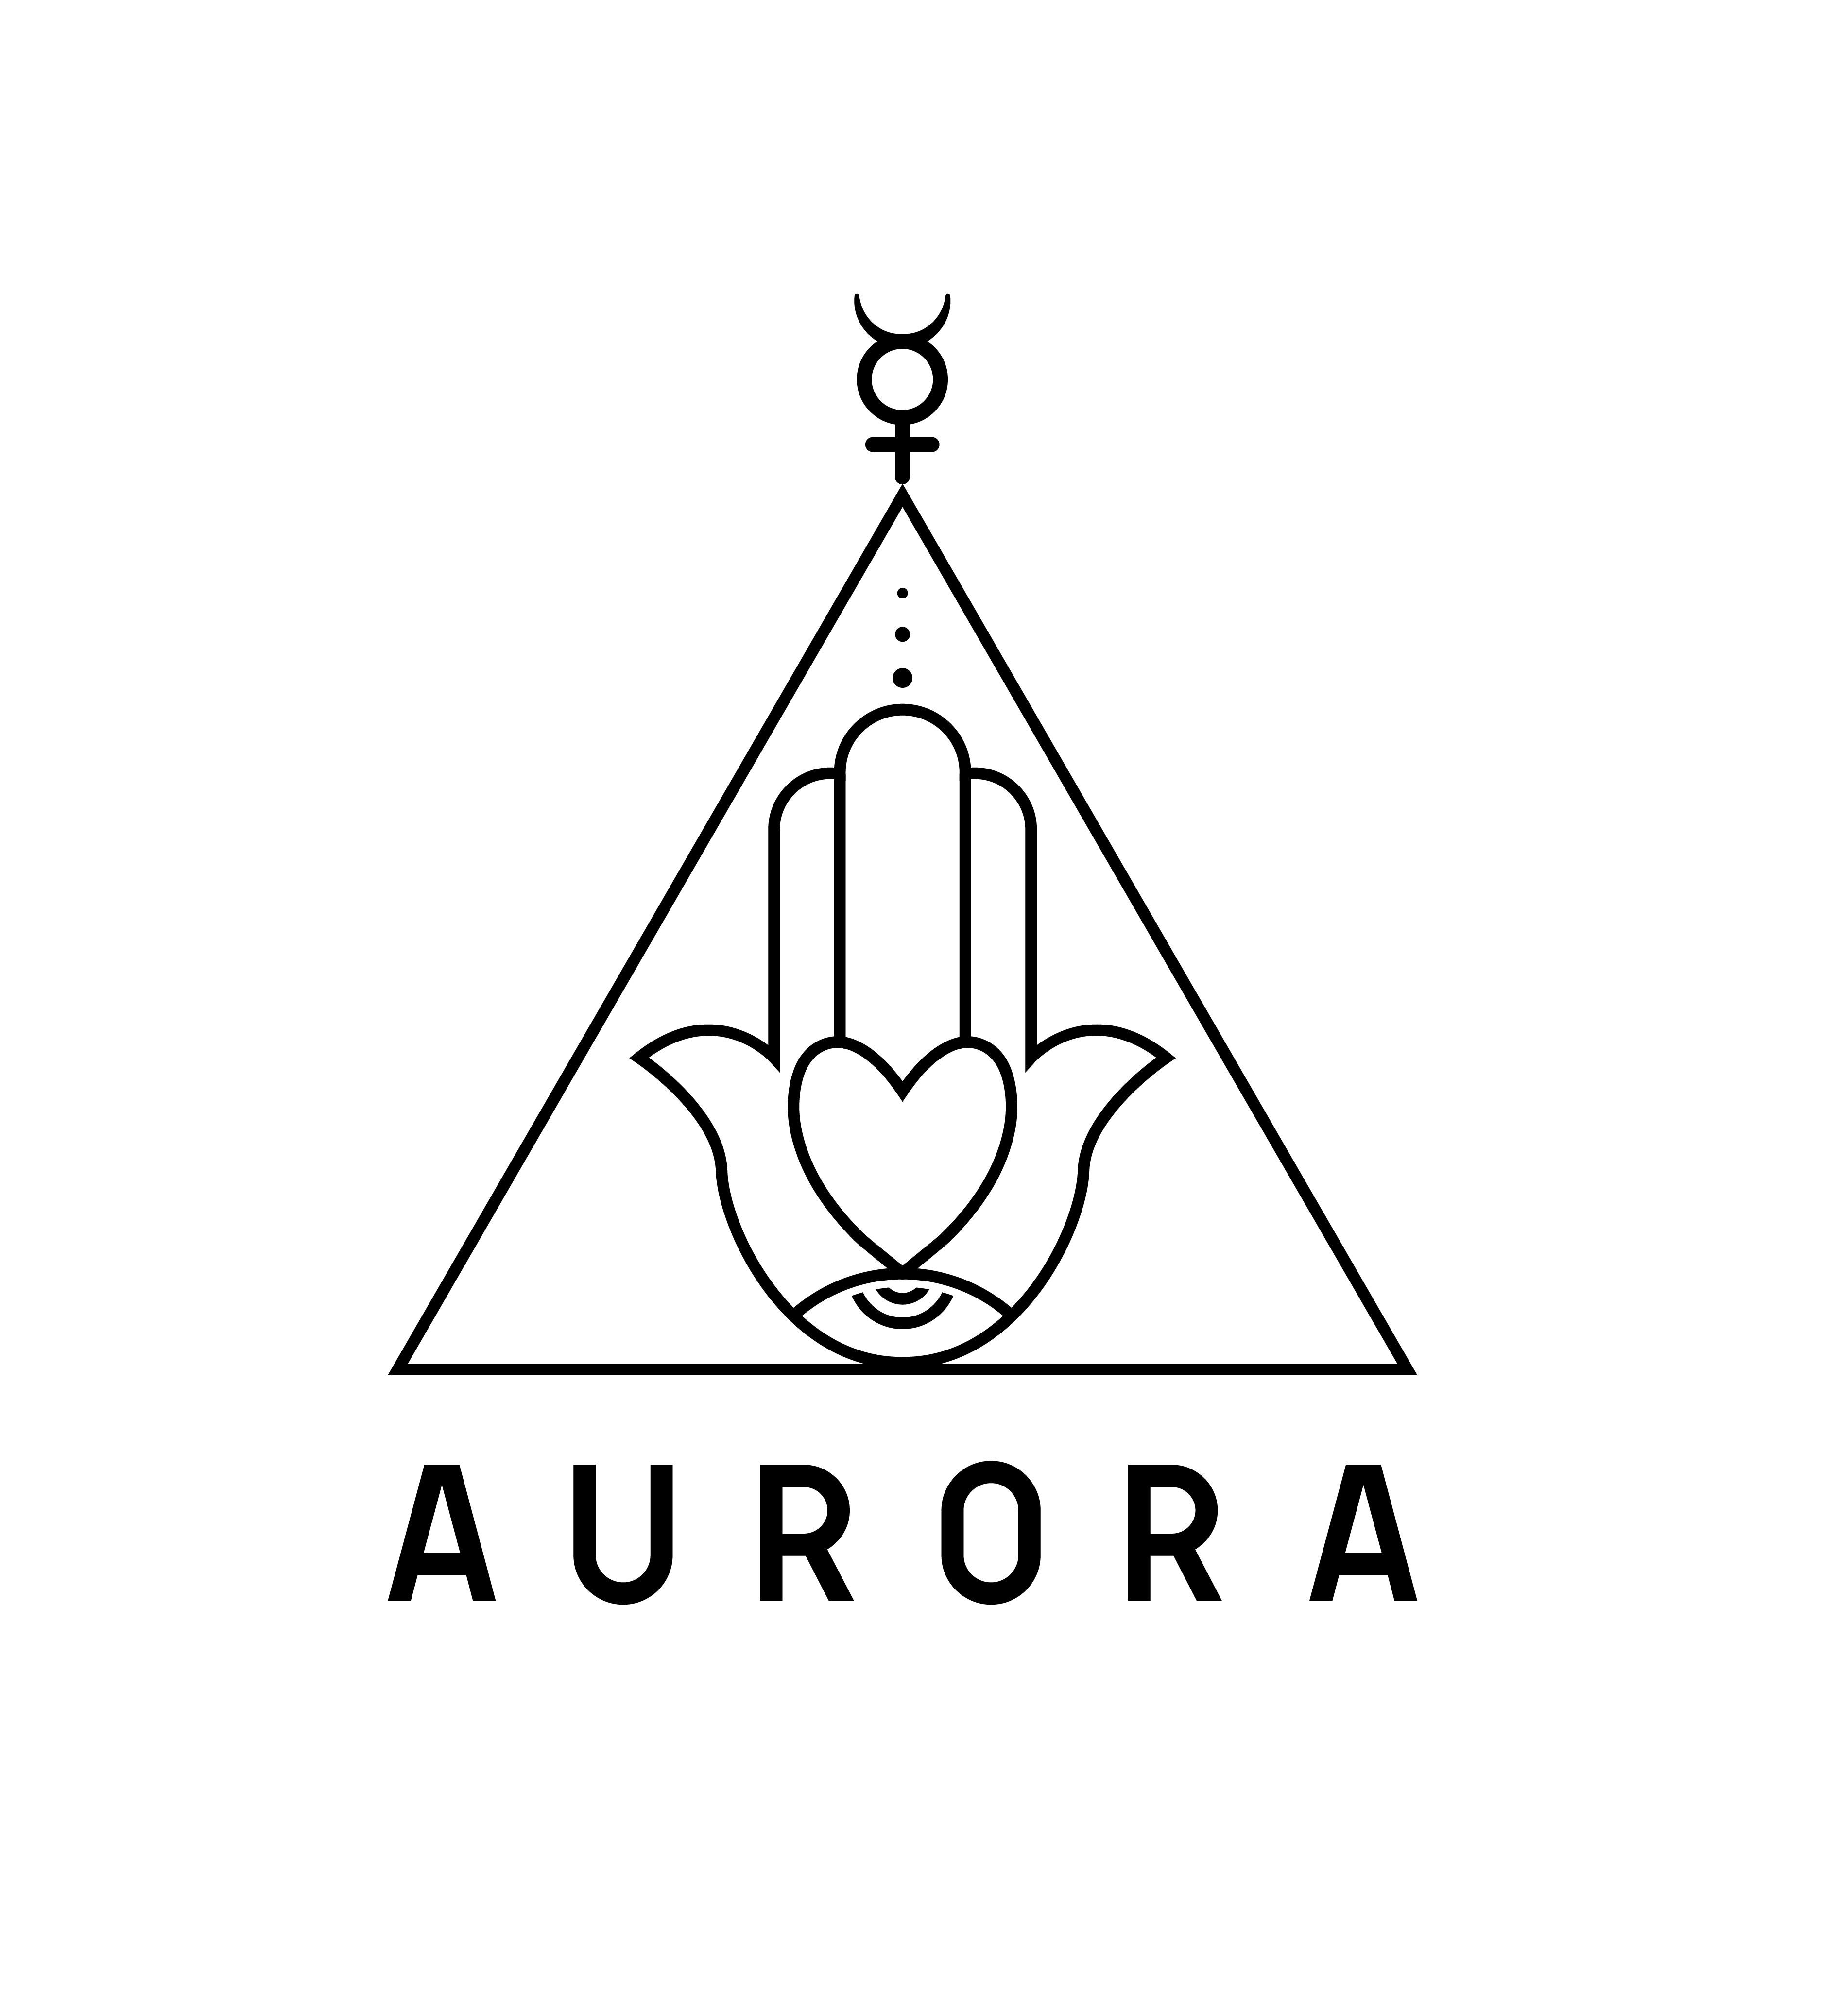 Aurora Astrologia